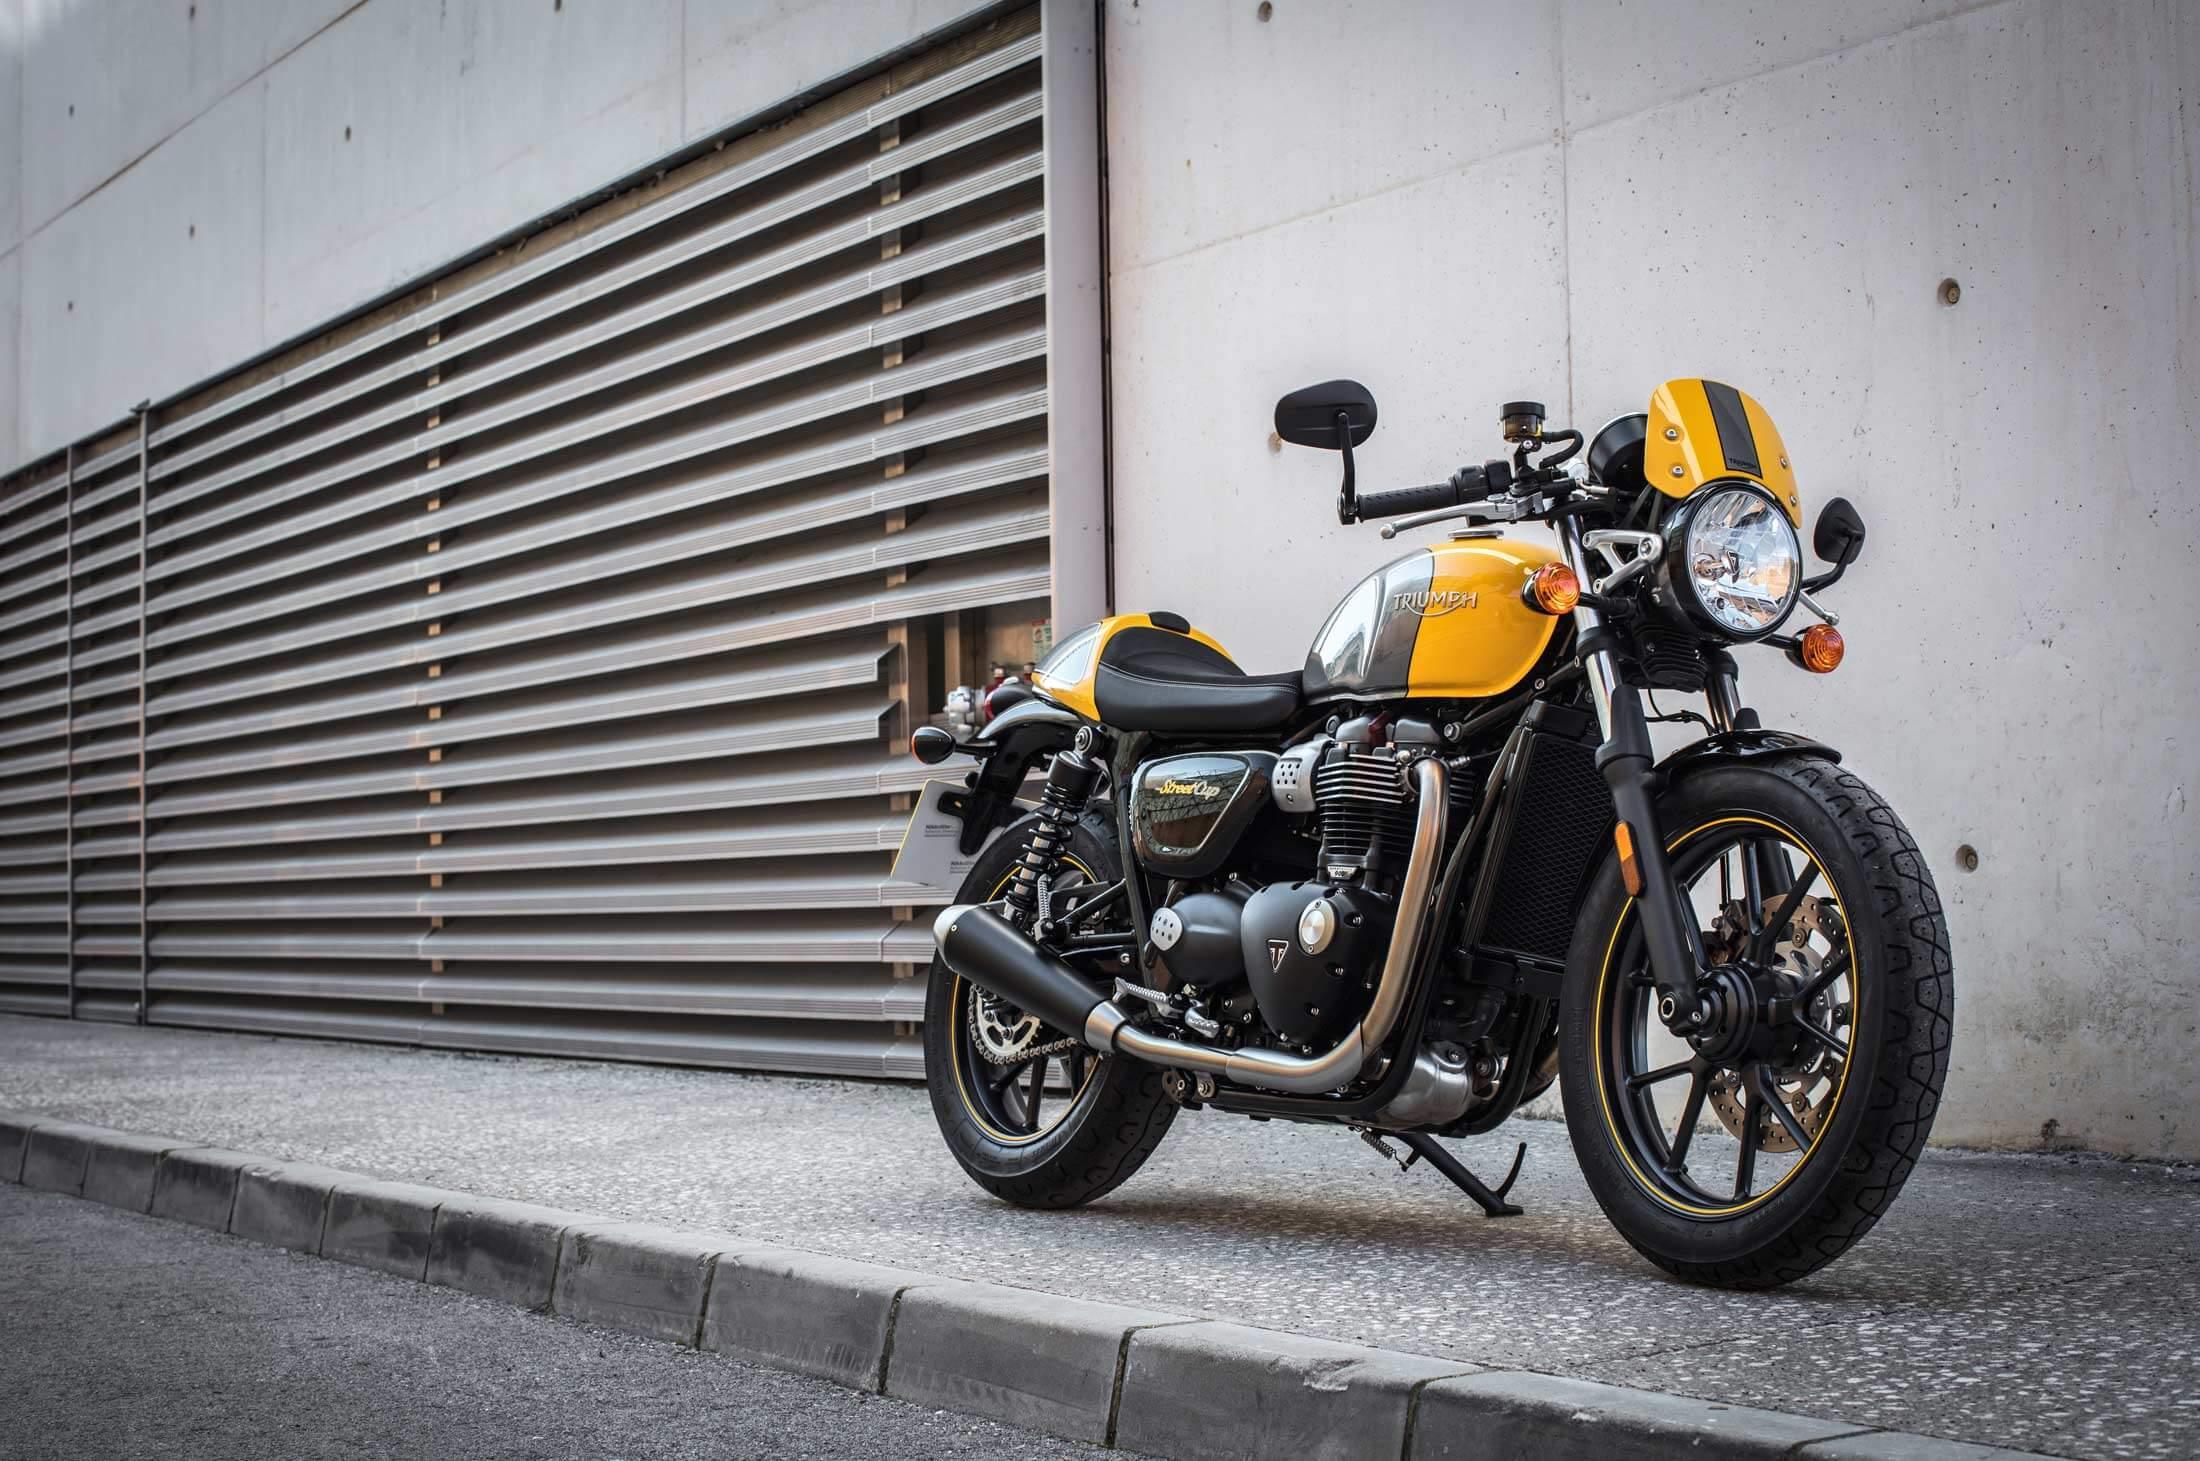 Moto anglaise occasion le top la Triumph Street Cup - Blog Ukmoto importation Moto Angleterre